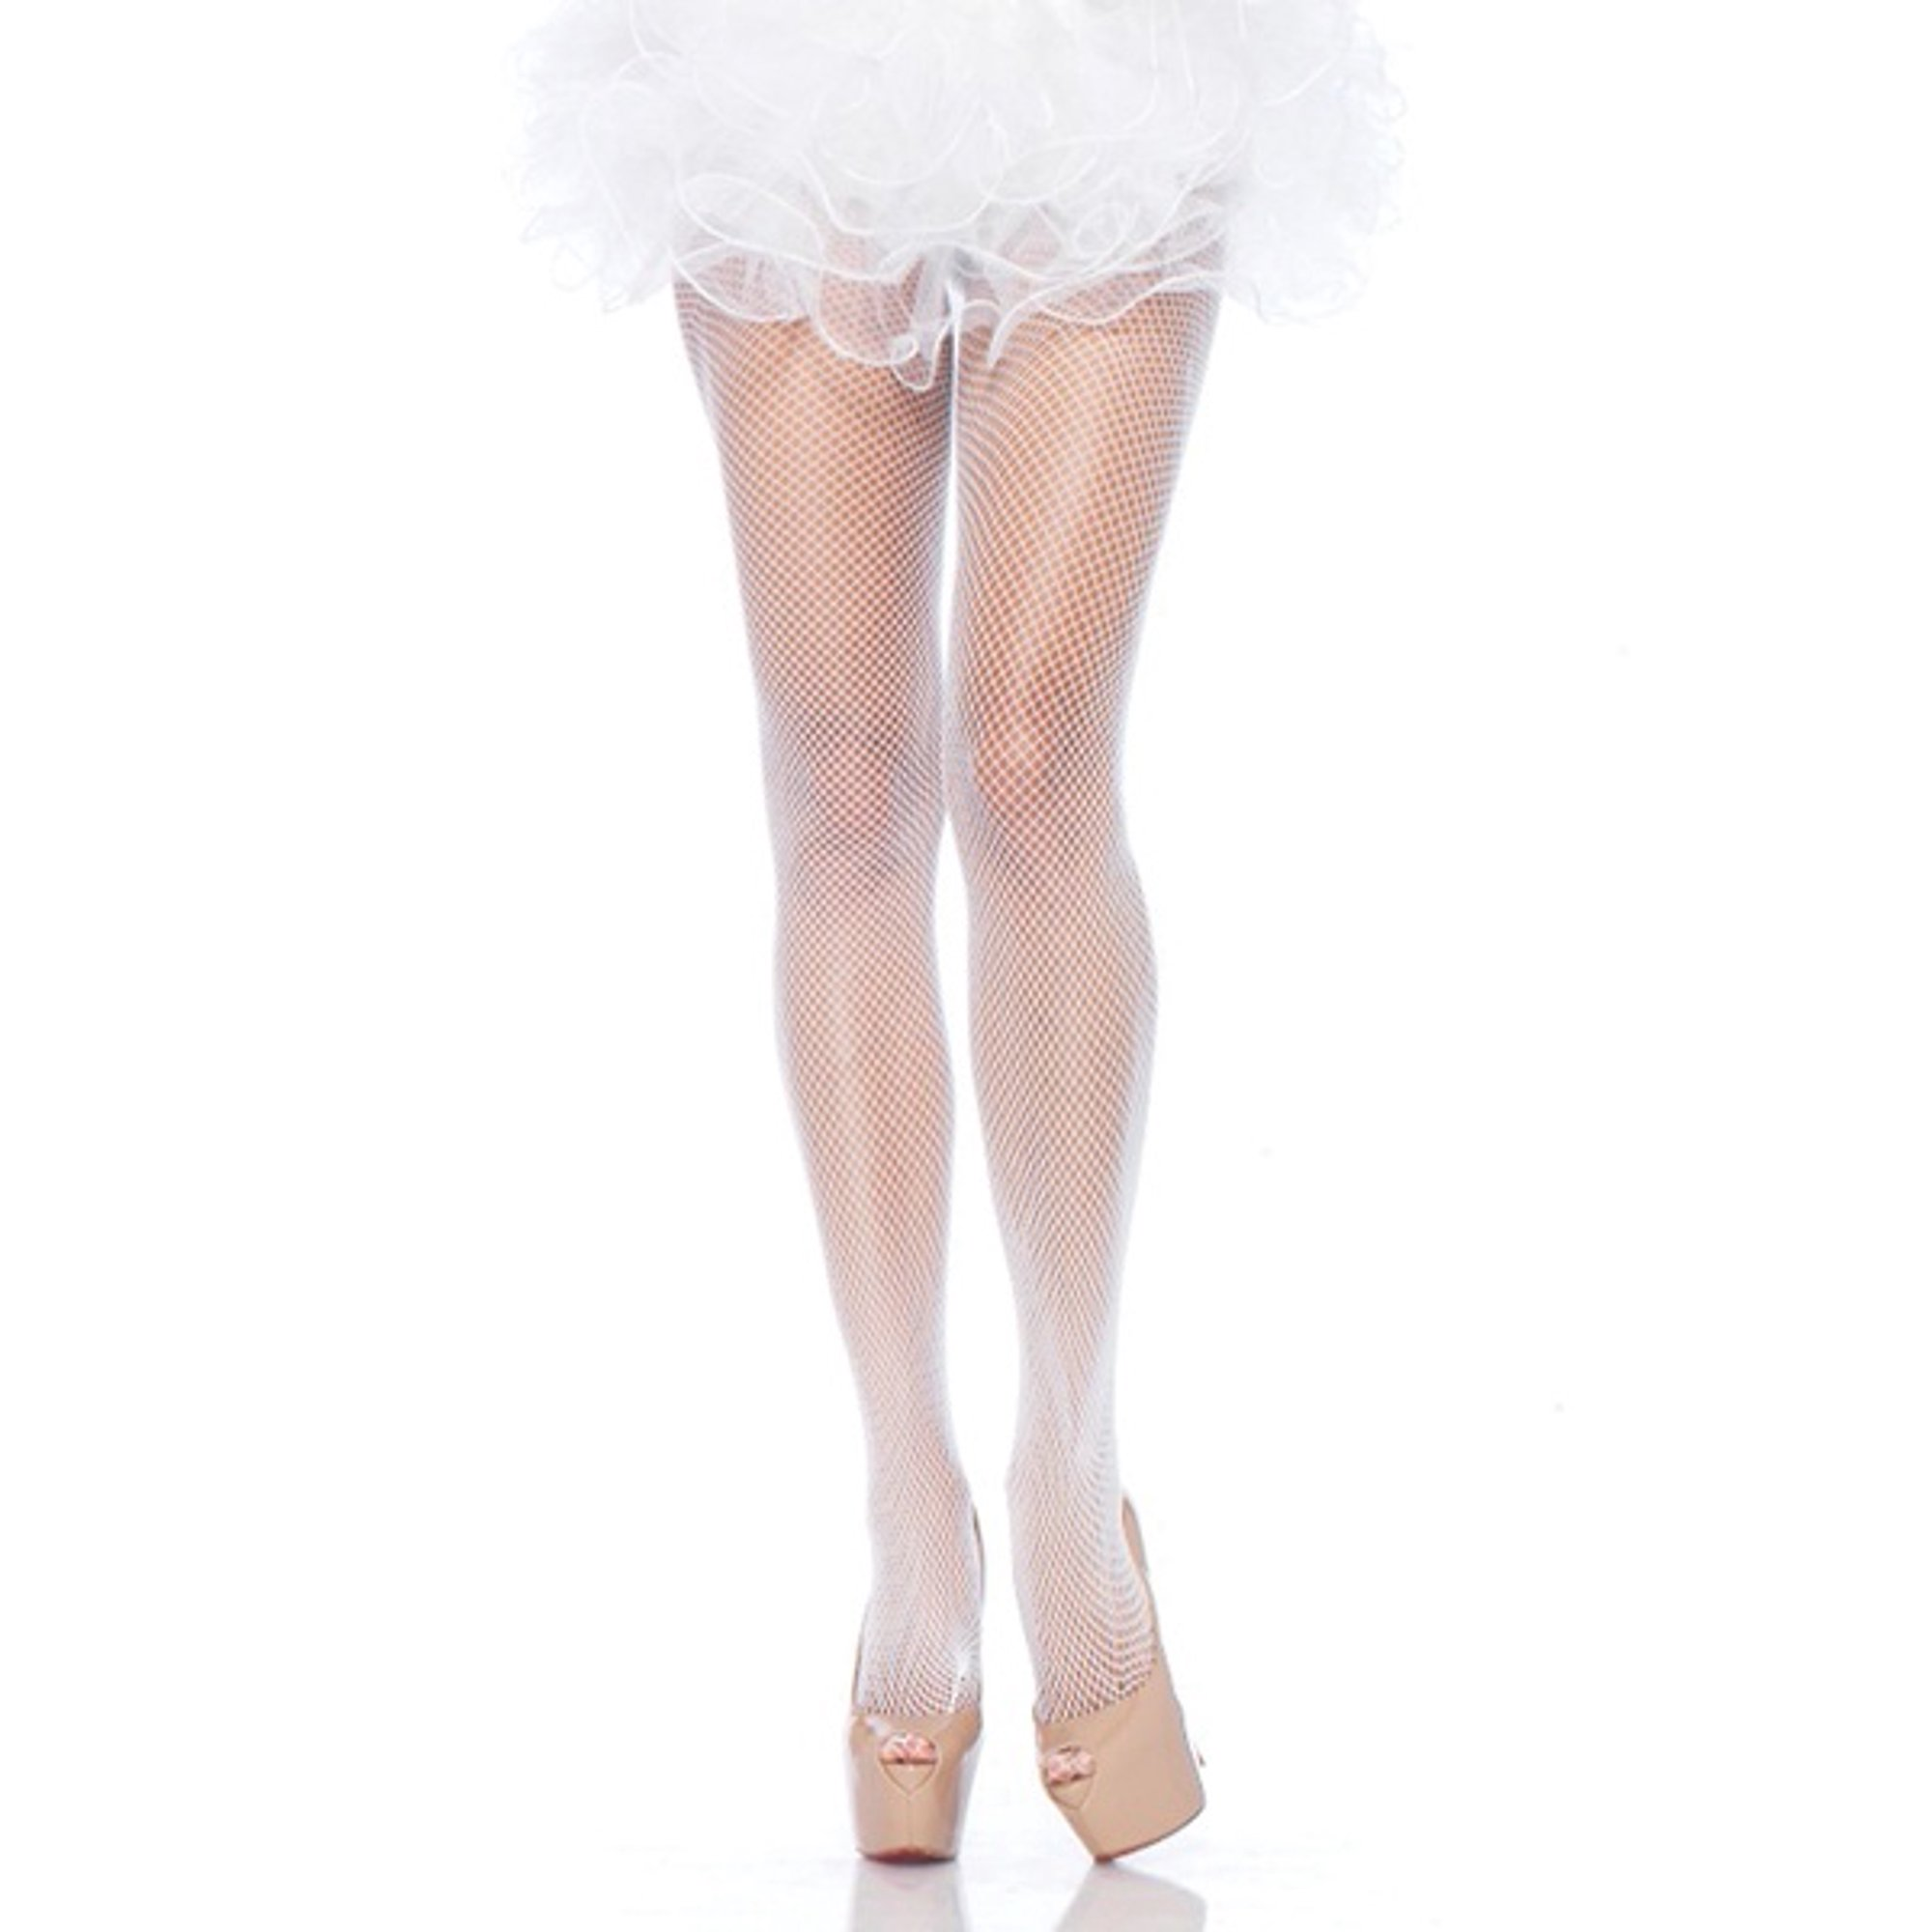 b82e1ccb9d869 Adult White Fishnet Stockings | Walmart Canada